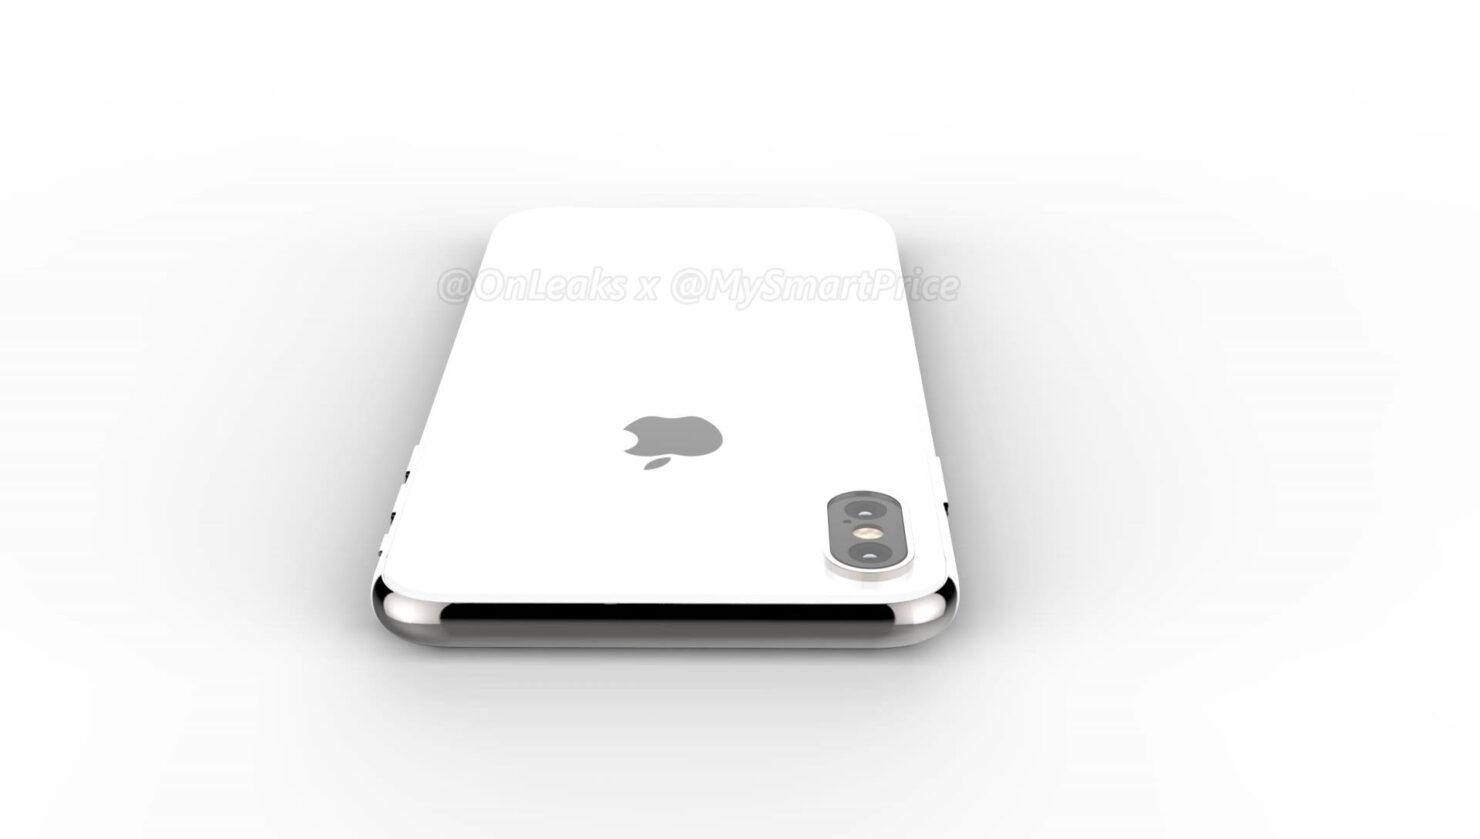 apple-iphone-x-plus-6-5-inch-11